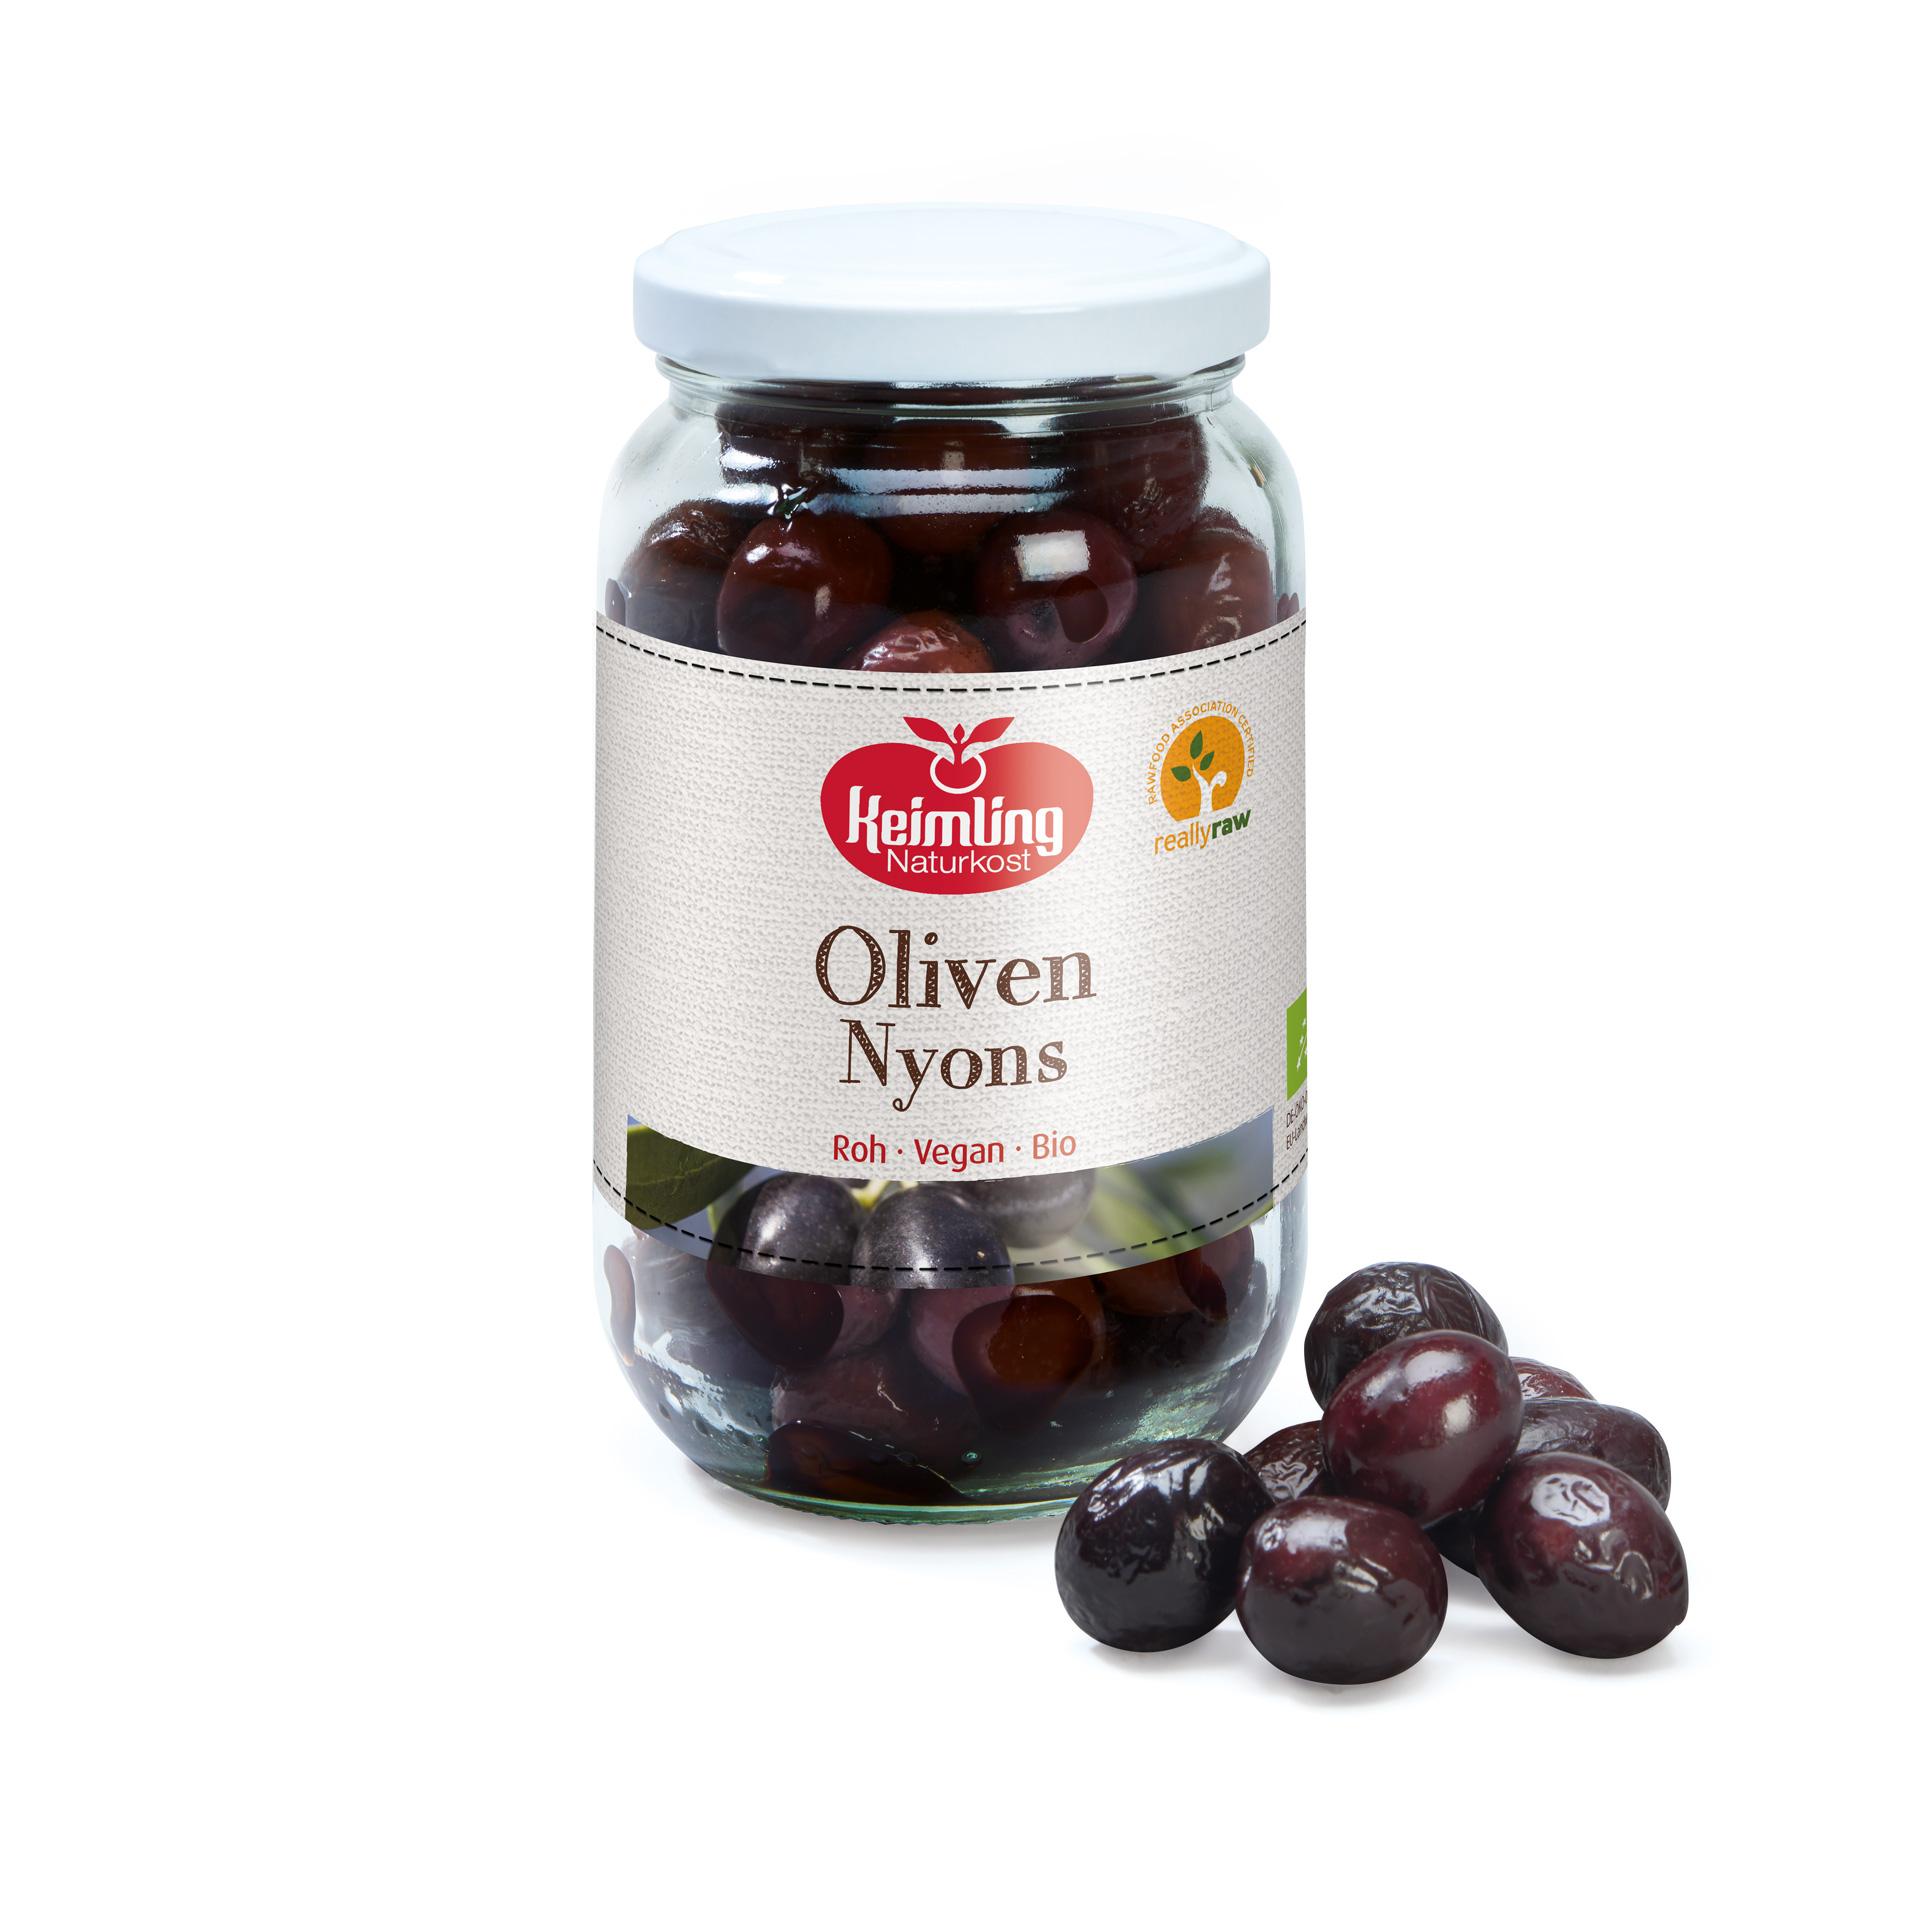 Oliven Nyons von Keimling NAturkost, really-raw zertifiziert